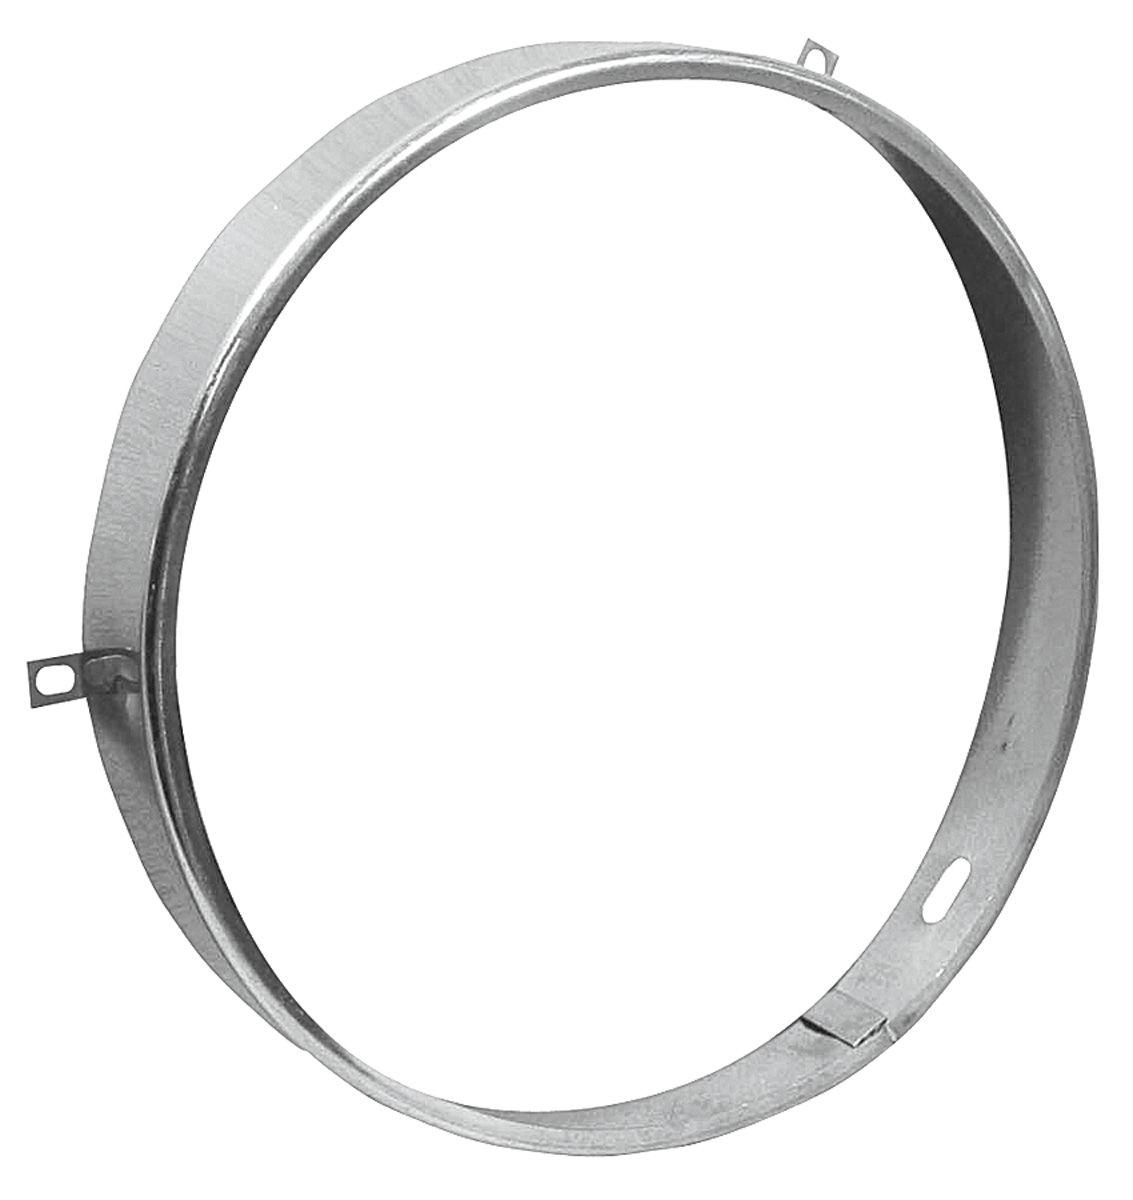 Retaining Ring, Headlamp, 1971-75 (1970-72 Monte Carlo, Reproduction